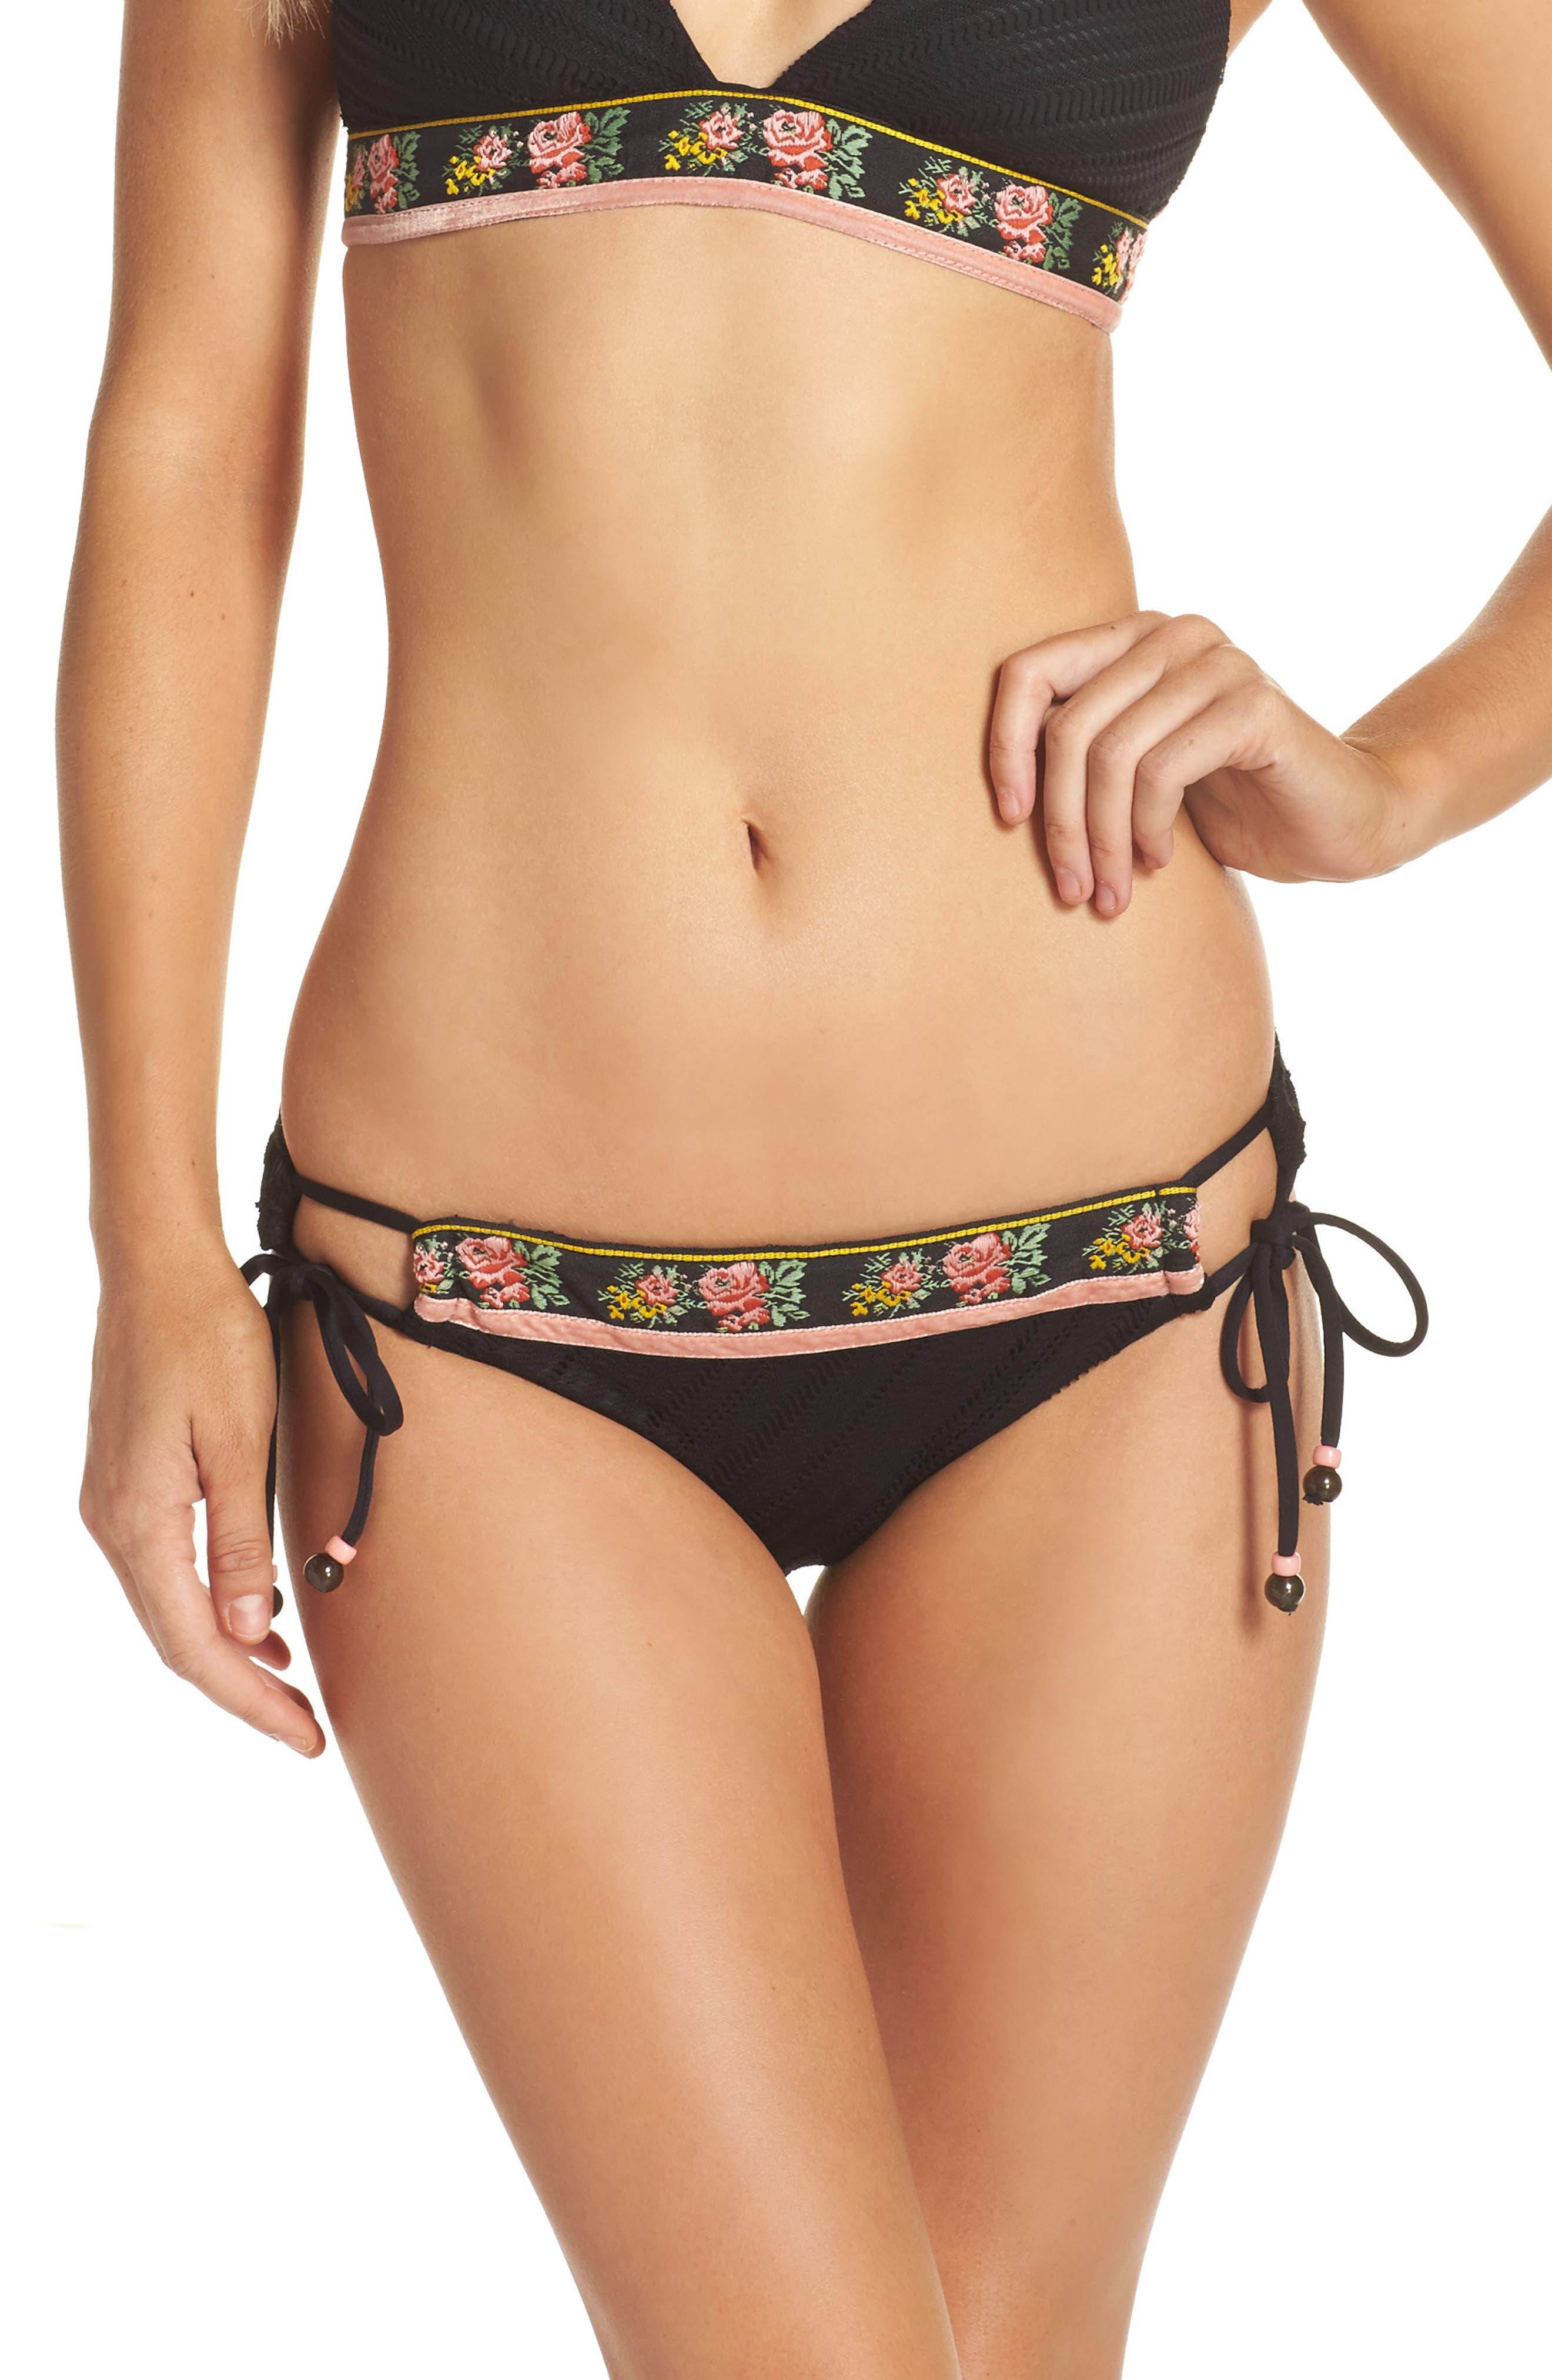 Fortune Teller Bikini Bottoms,                             Main thumbnail 1, color,                             001